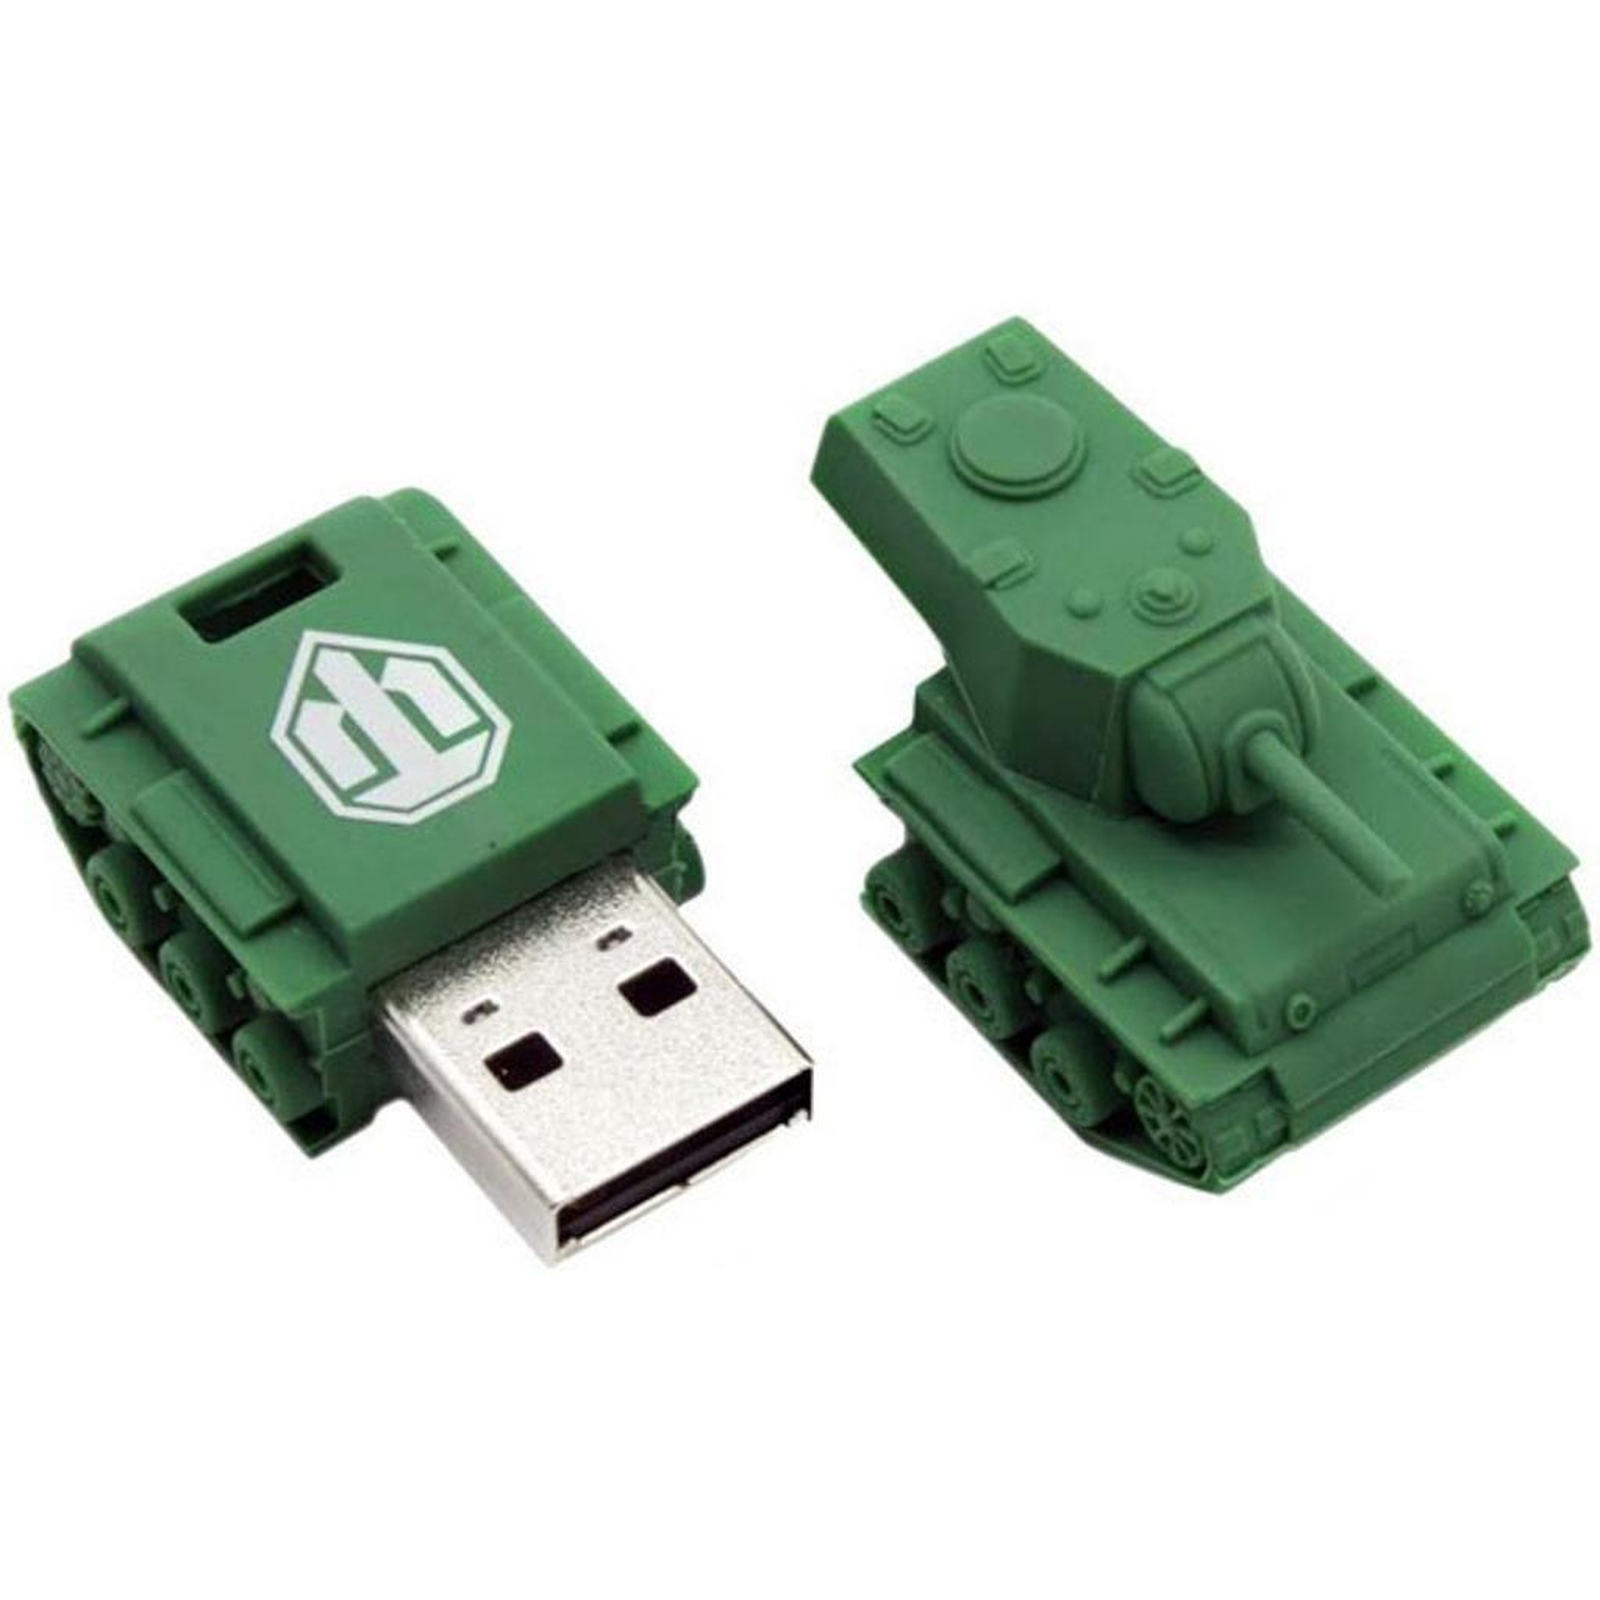 USB флеш накопитель Kingston 64 GB Custom Rubber Tank (DT-TANK/64GB) изображение 3